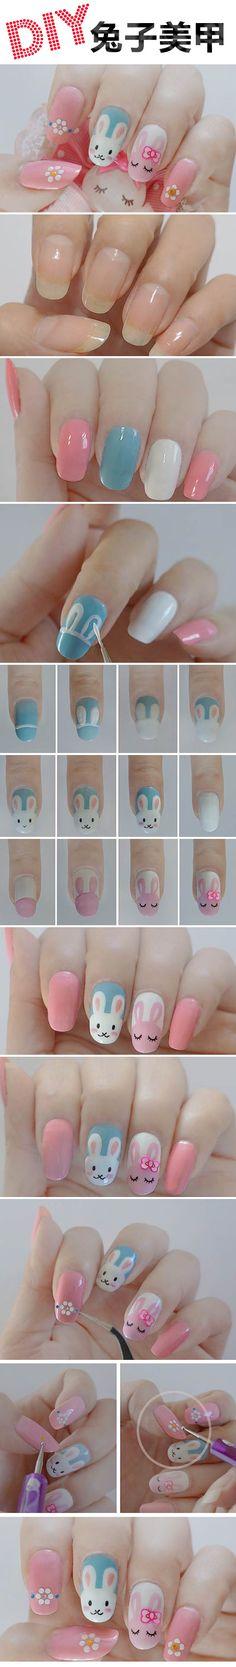 15 Amazing And Useful Nails Tutorials, DIY Cute Rabbit Nail Design easter!